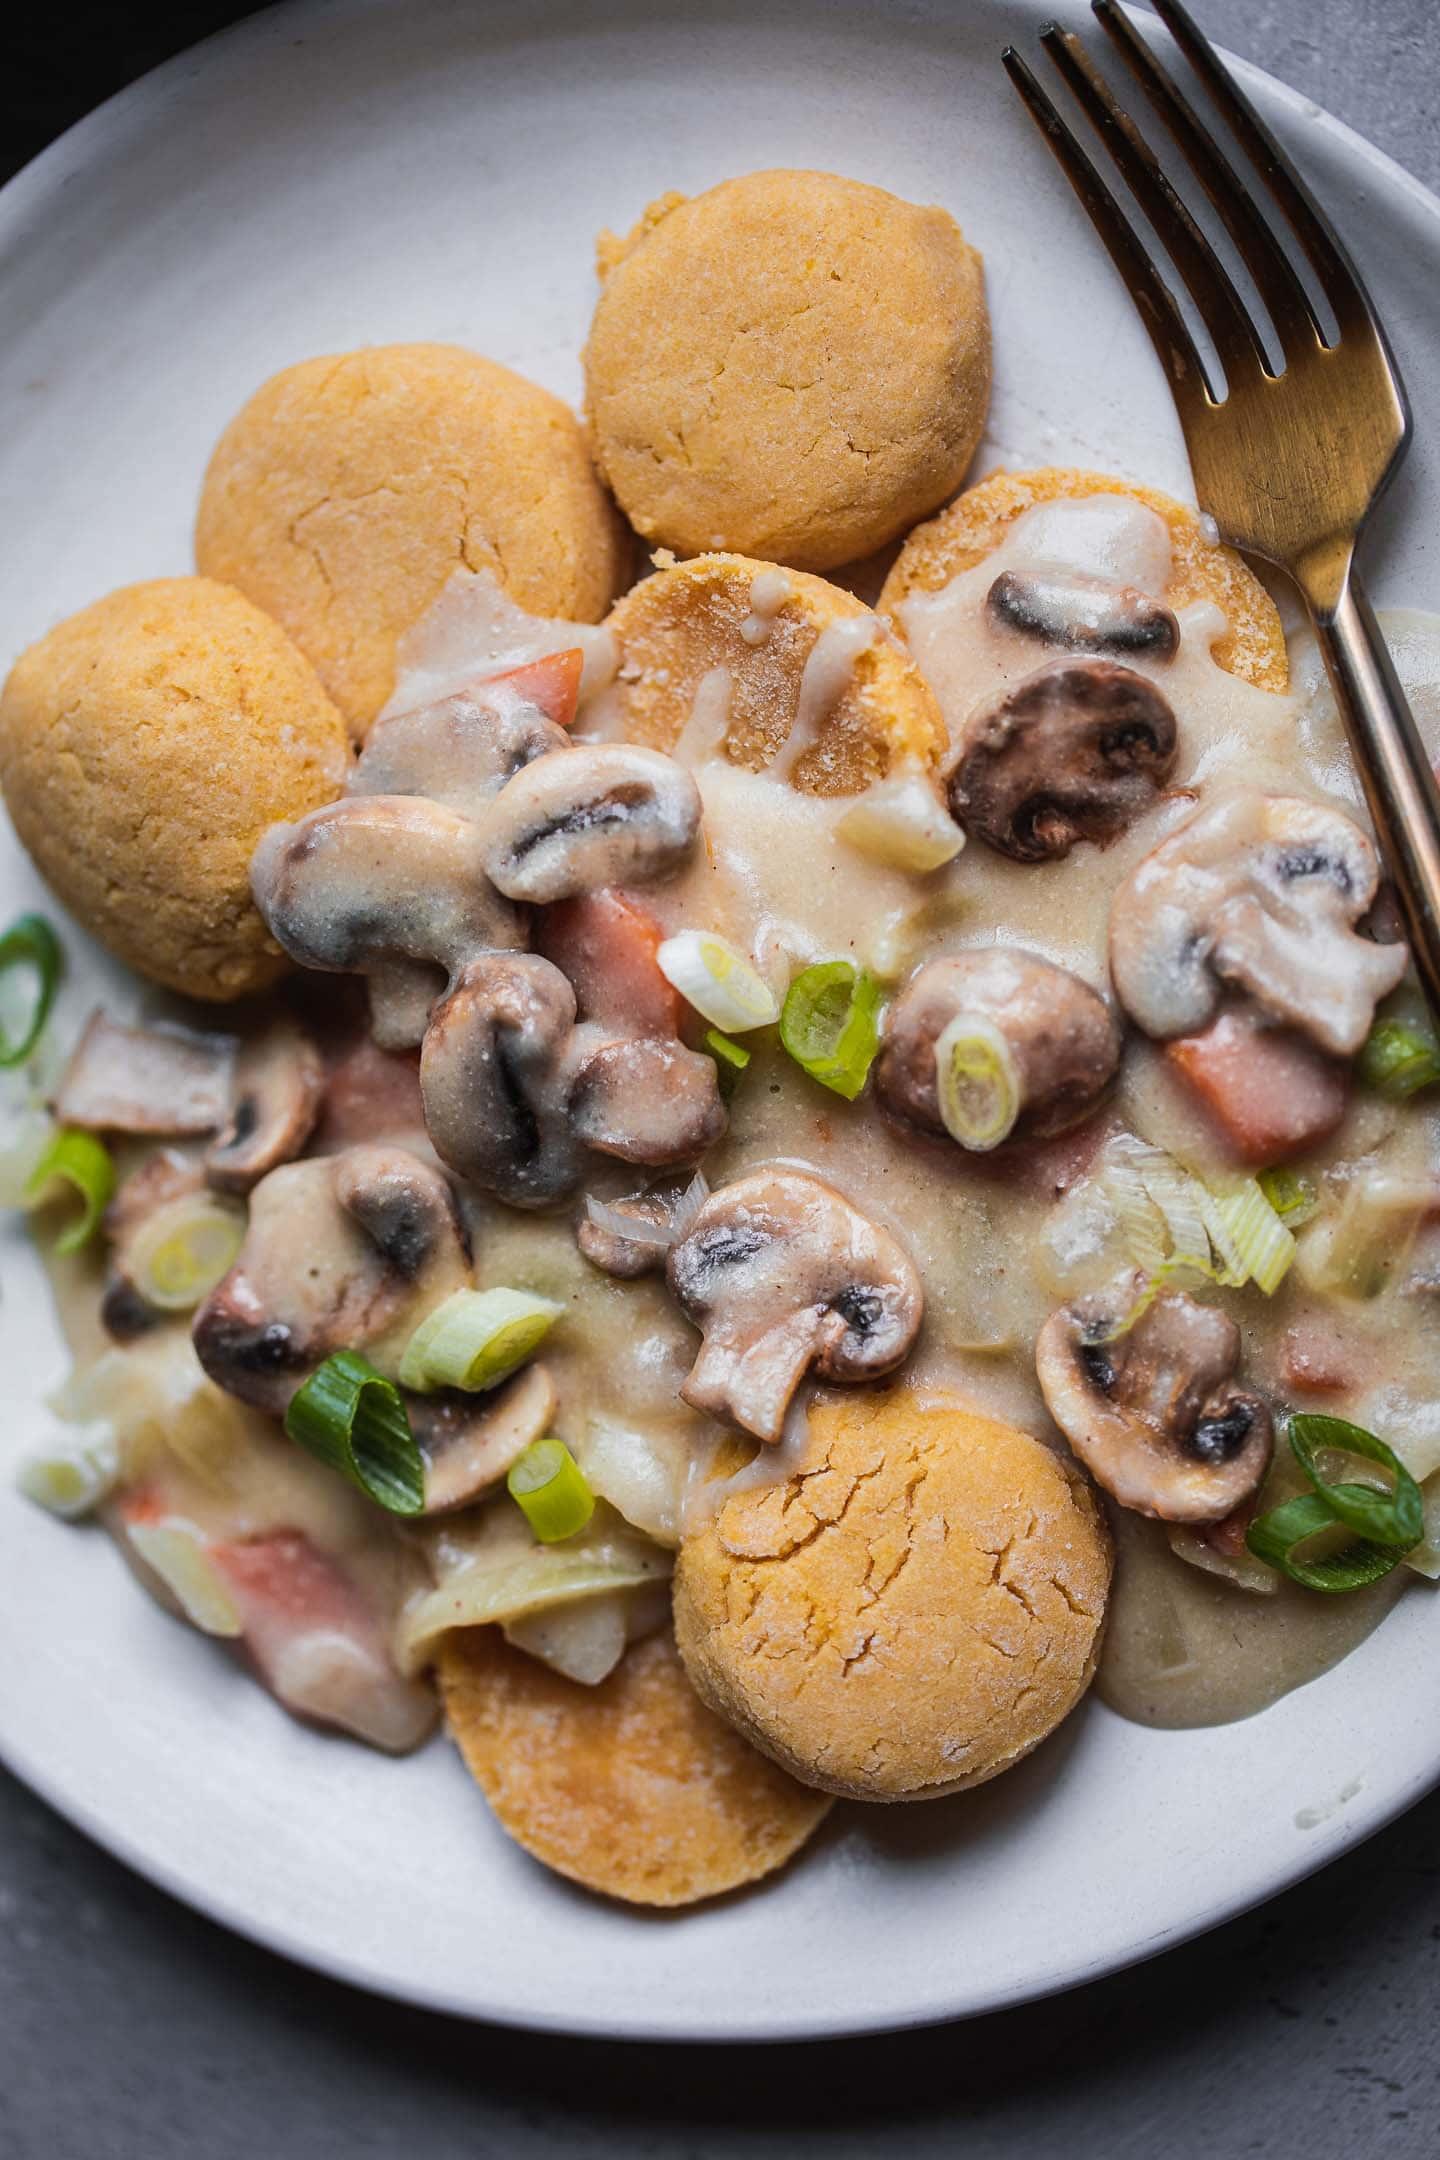 Plate of gluten-free vegan biscuits with mushroom gravy